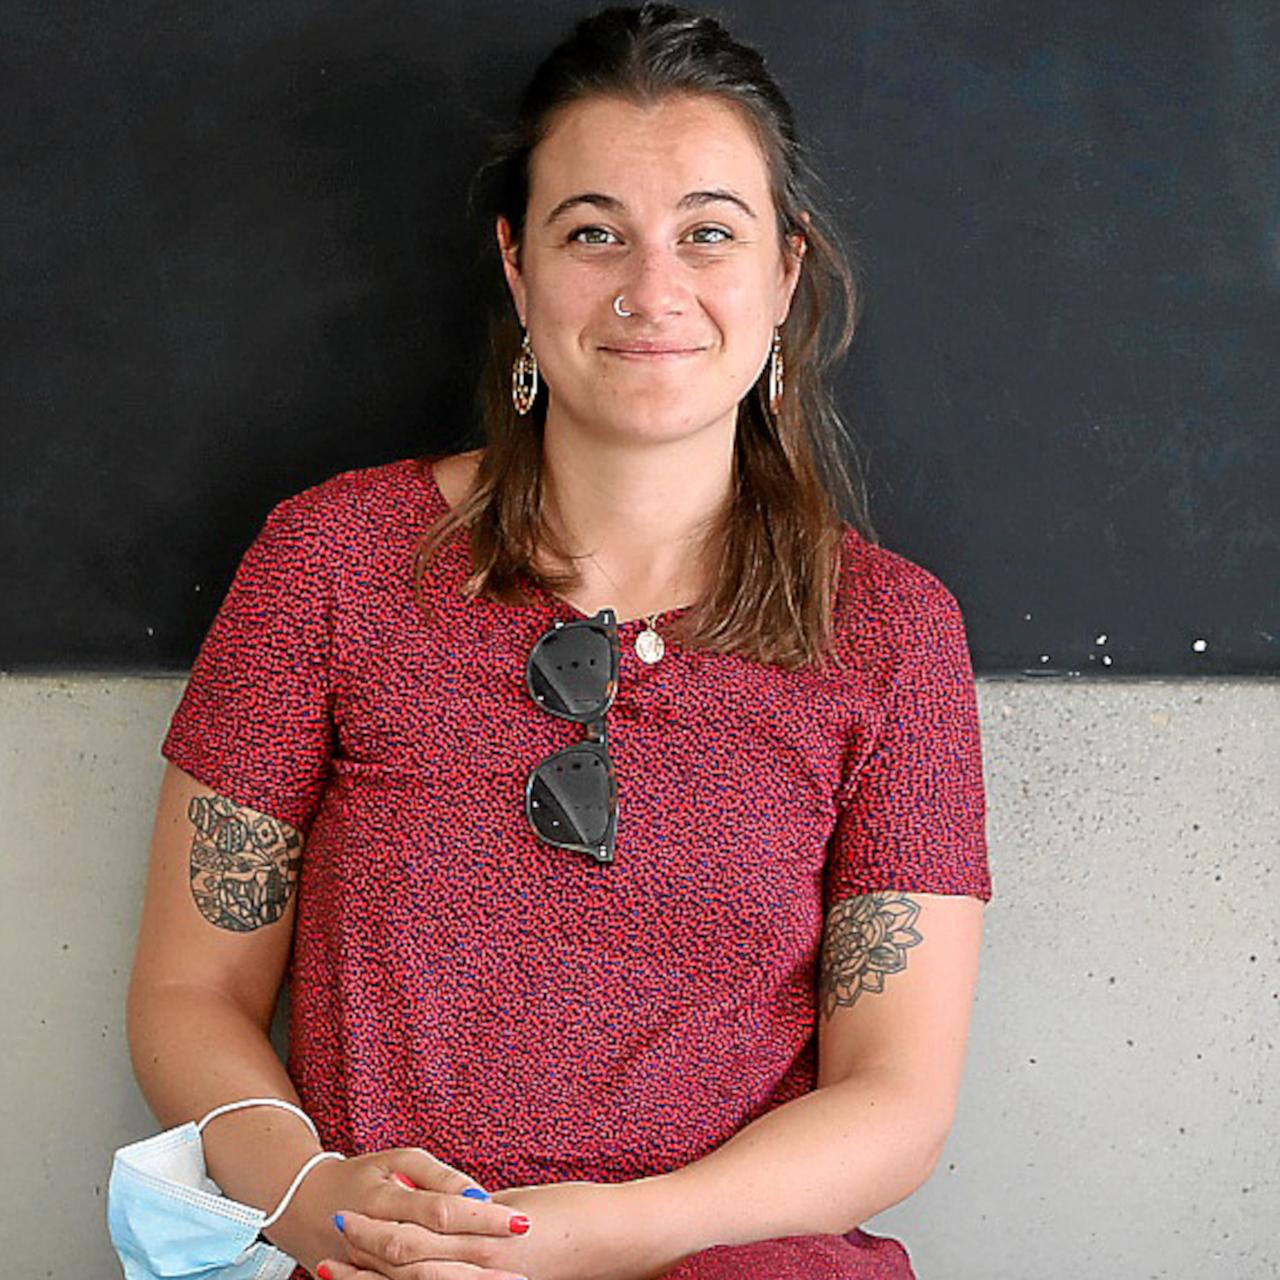 Inés Adán